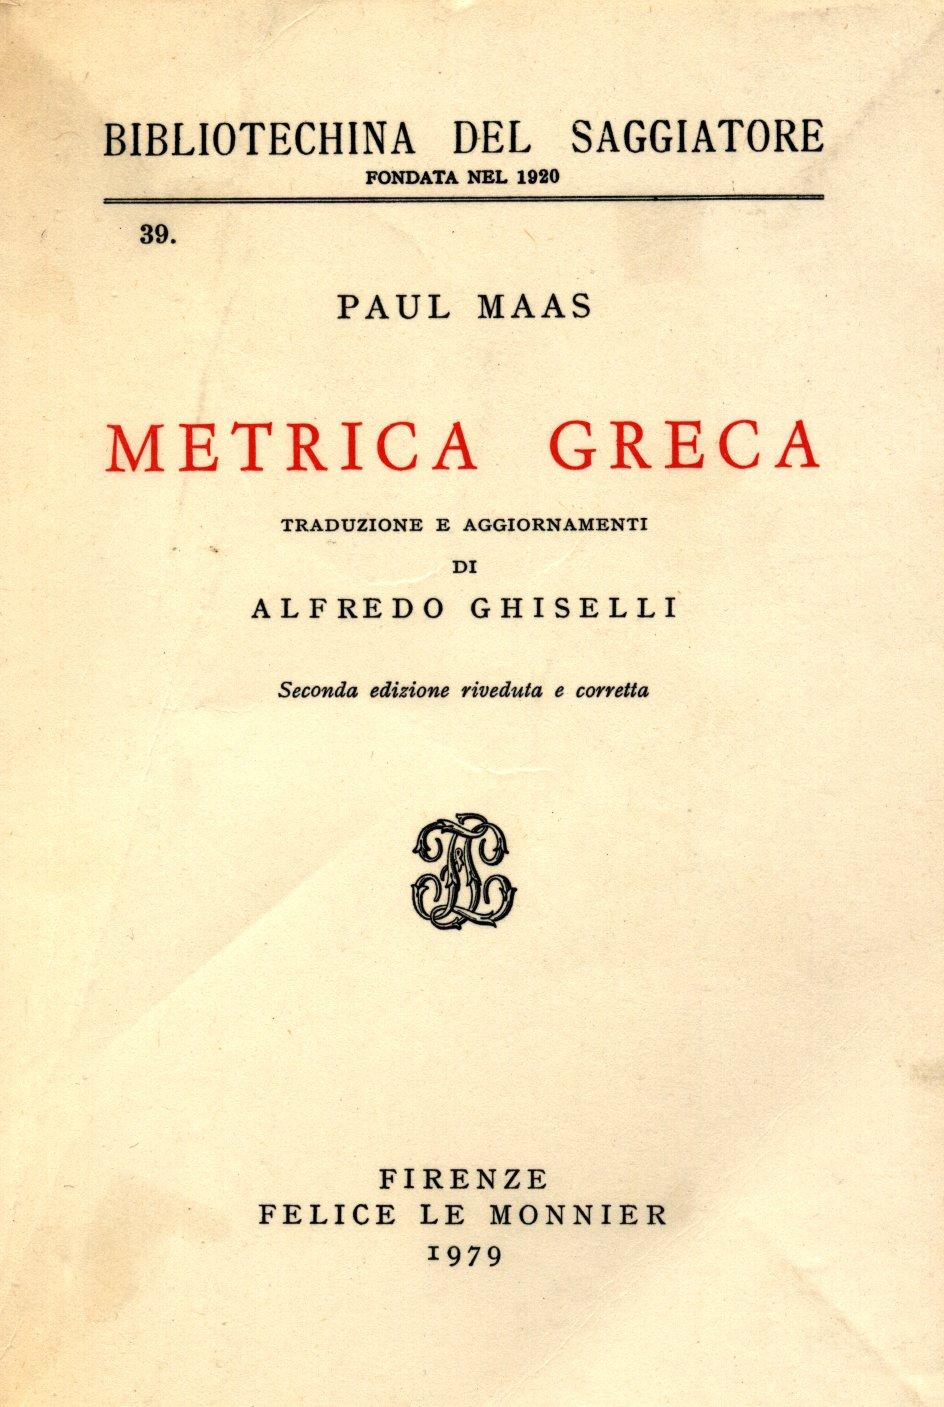 Metrica greca